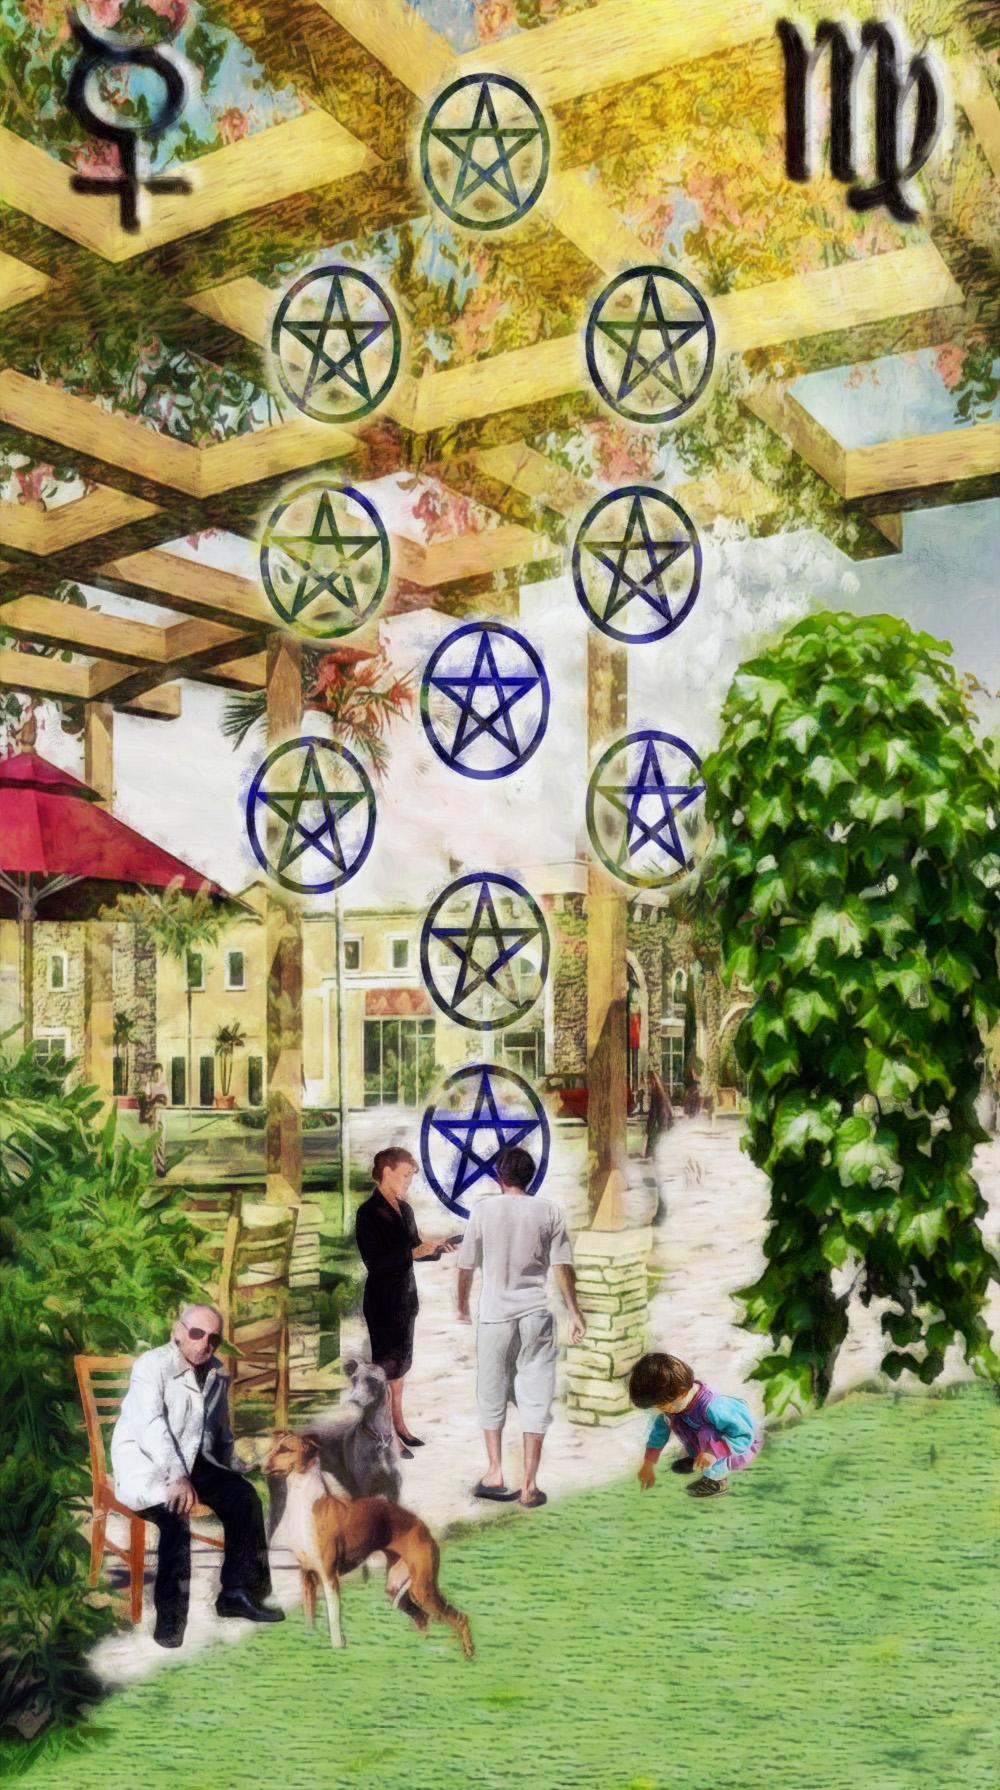 Ten Of Pentacles Reversed In A Reading